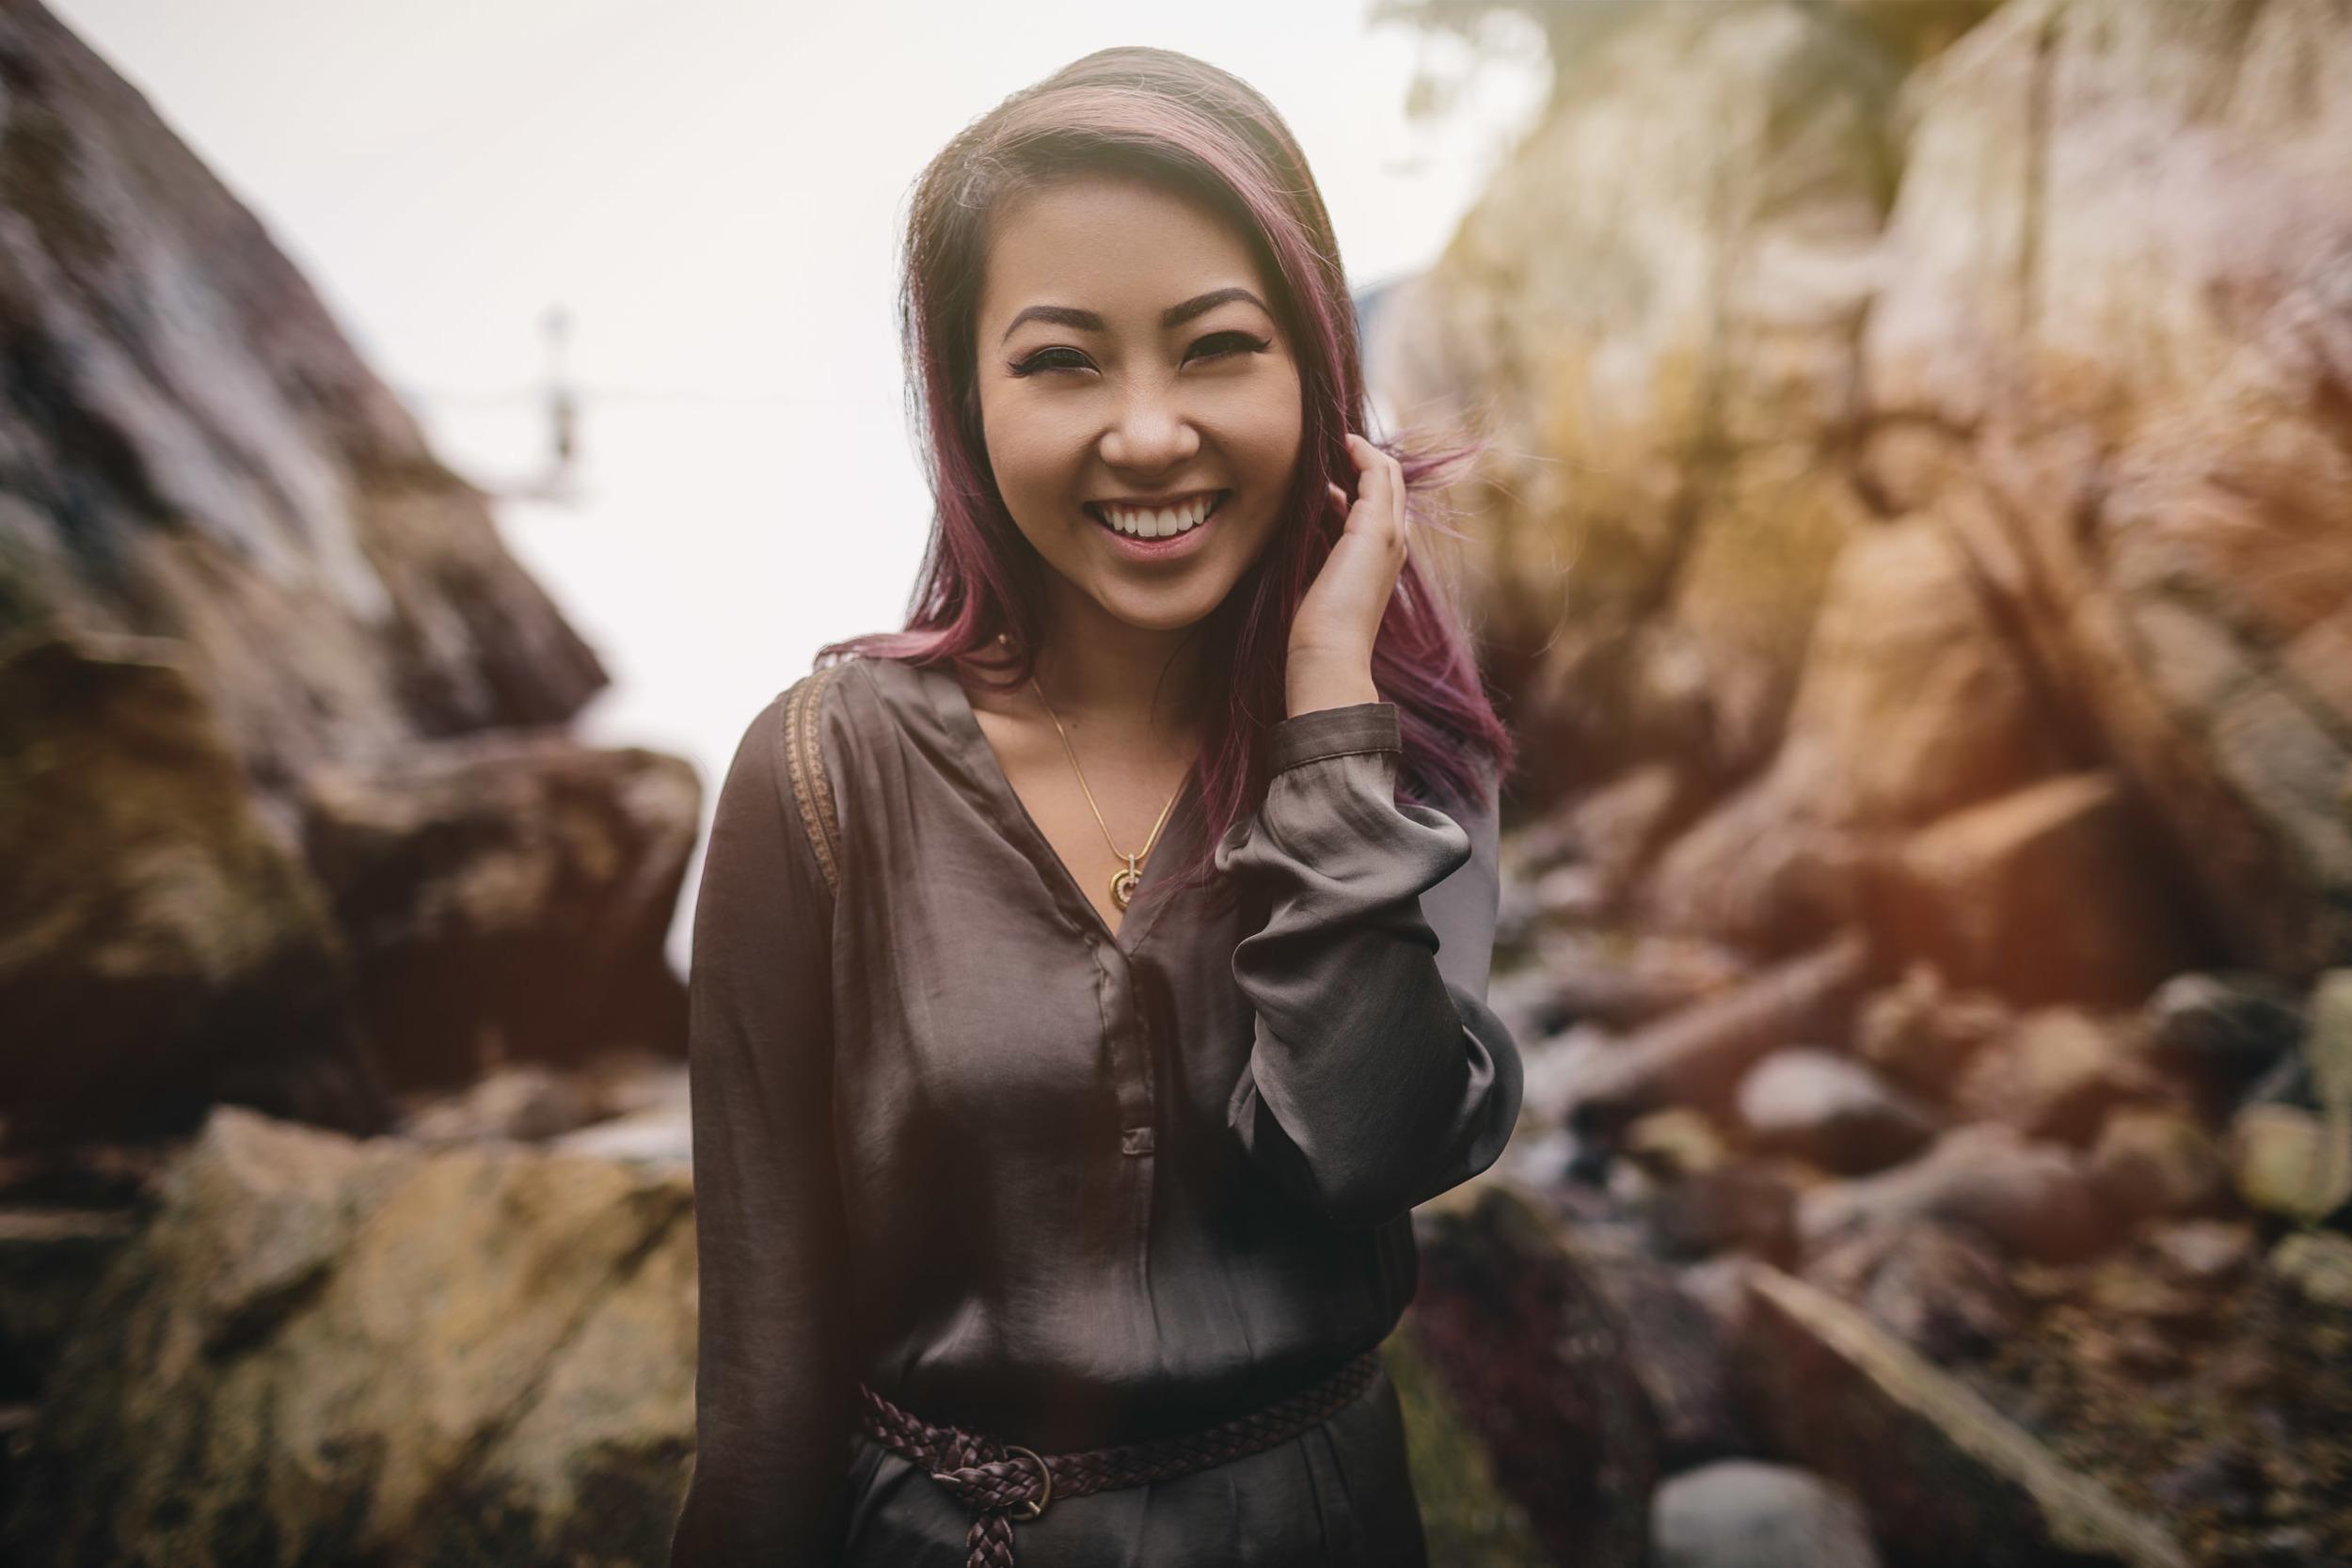 candid smile vancouver portrait photographer with Tien Nguyen whytecliff park